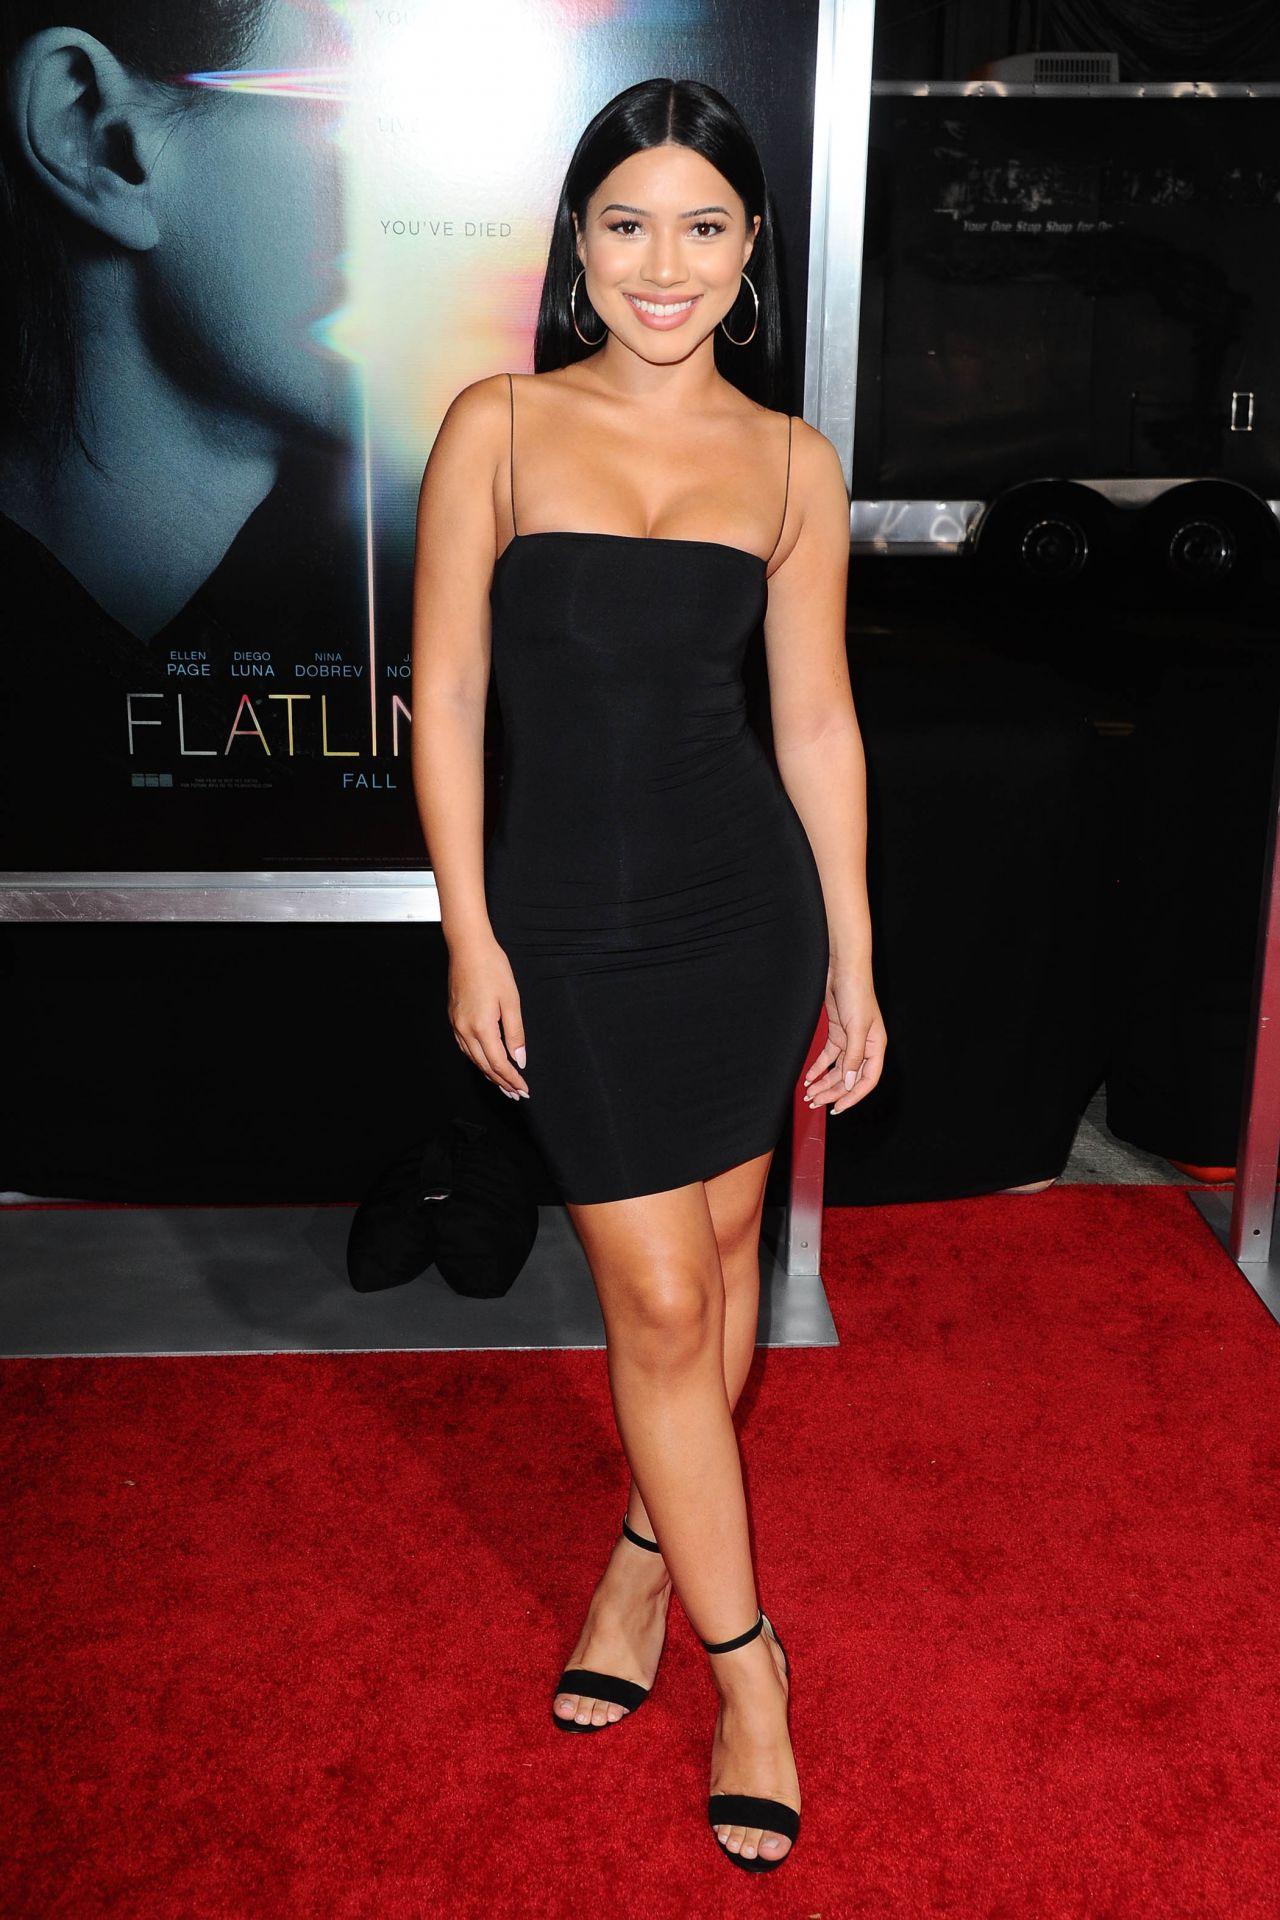 Julia Kelly Flatliners Premiere In Los Angeles 09 27 2017